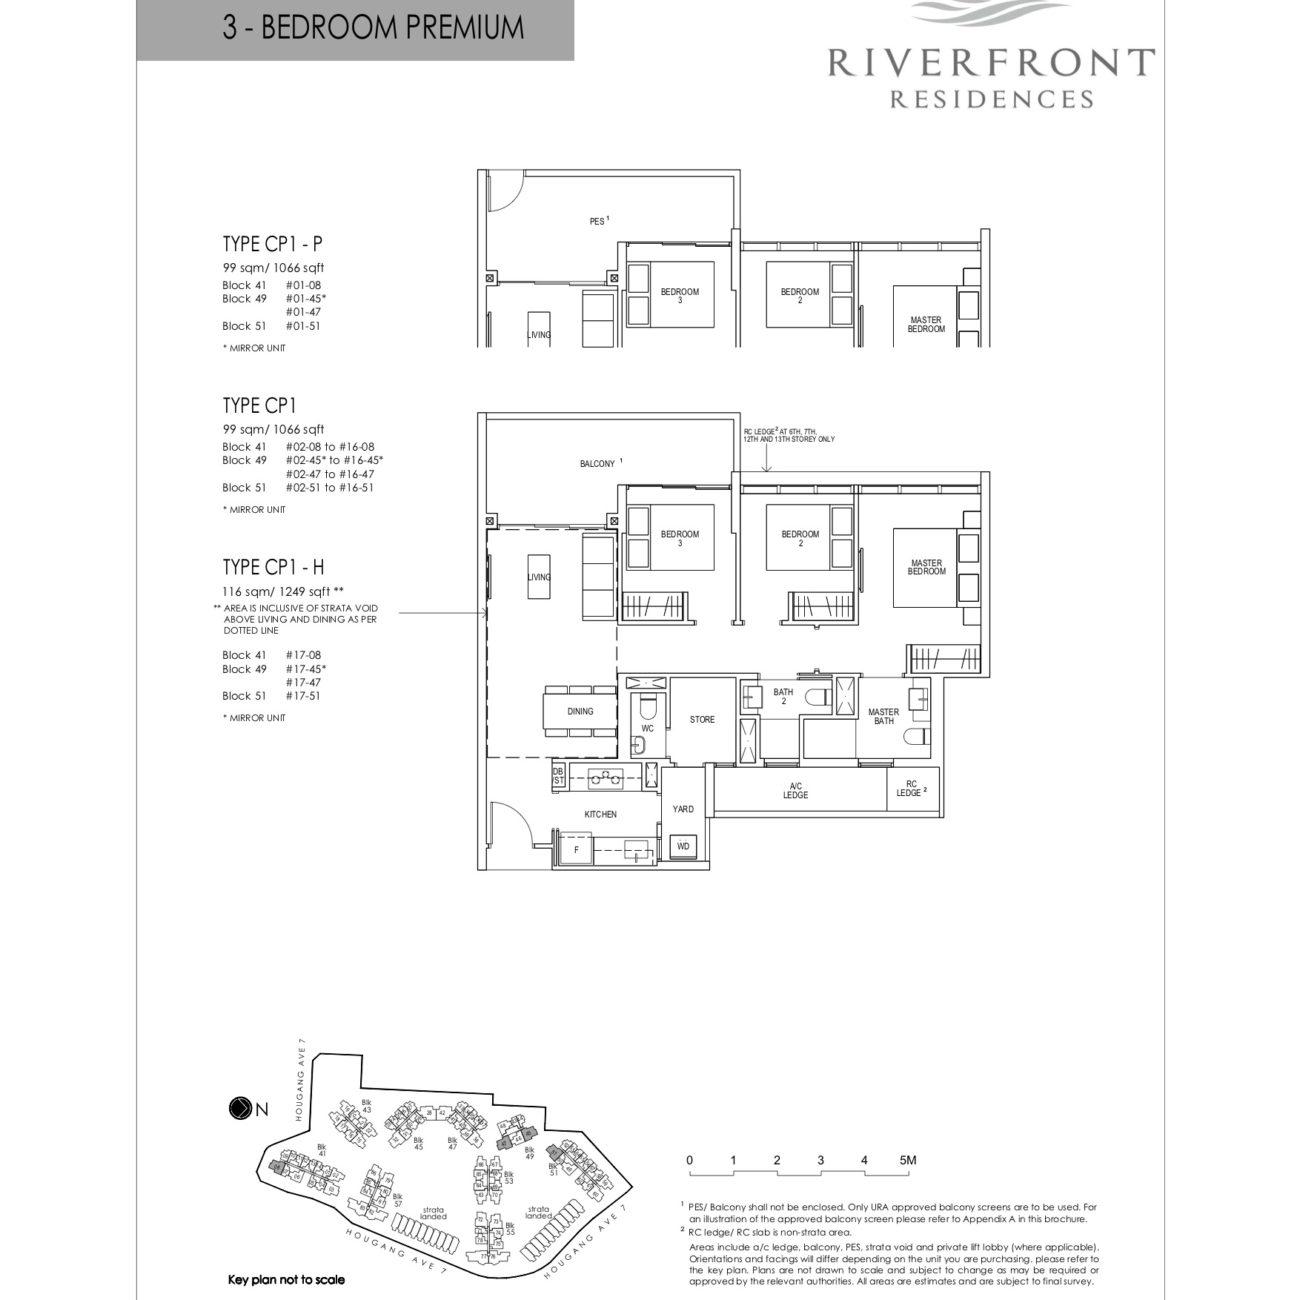 riverfront-residences-floorplan-3bedroom- premium-cp1